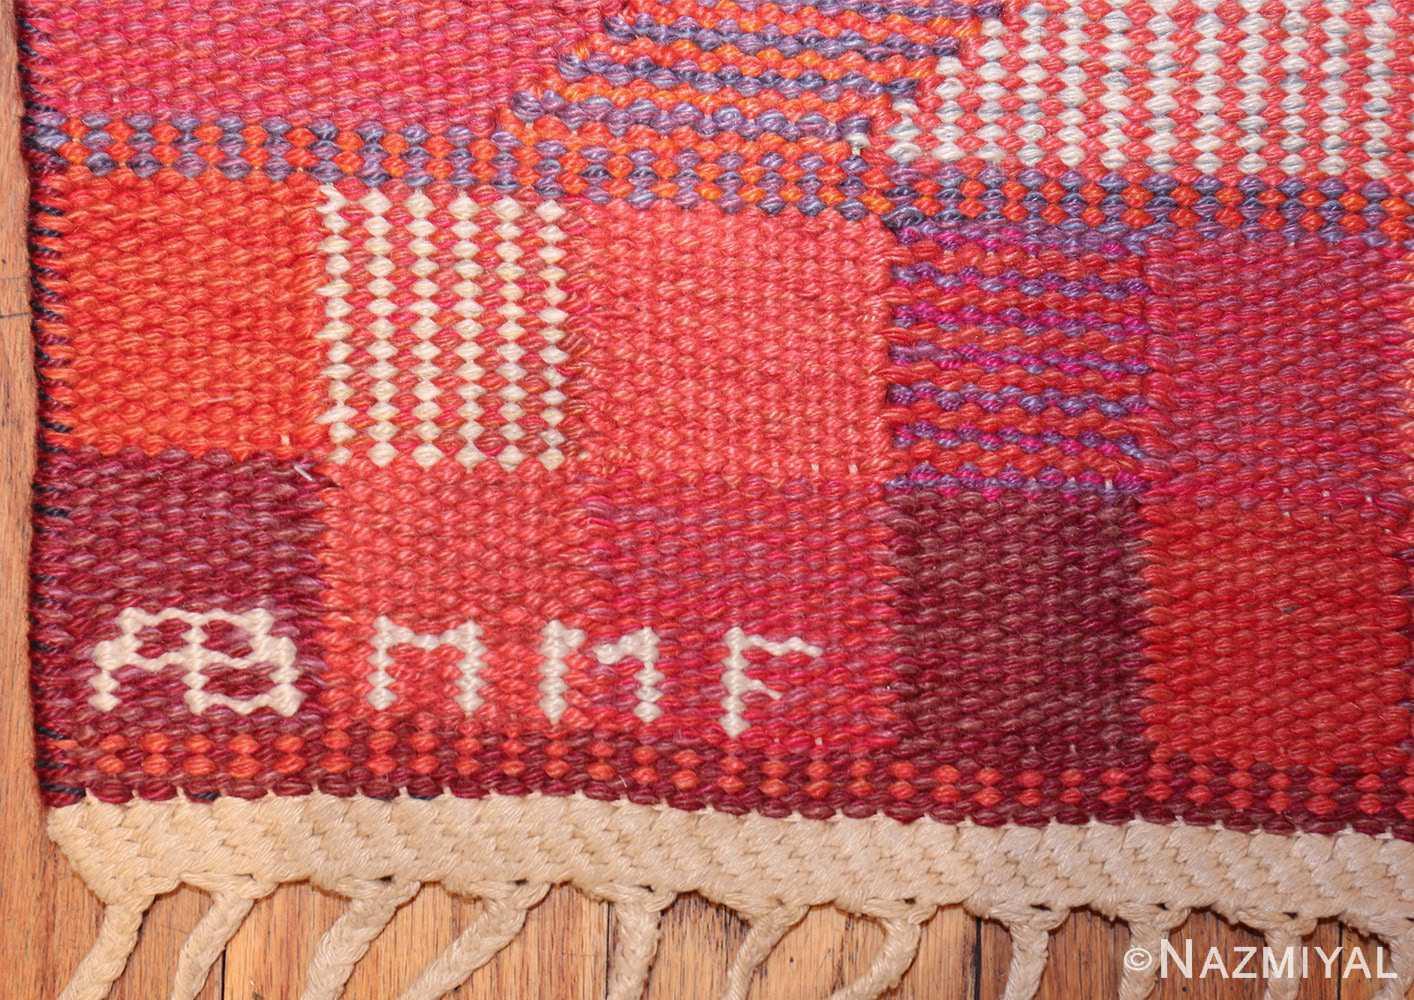 vintage geometric marta maas scandinavian rug by barbro nilsson 49563 mmf Nazmiyal